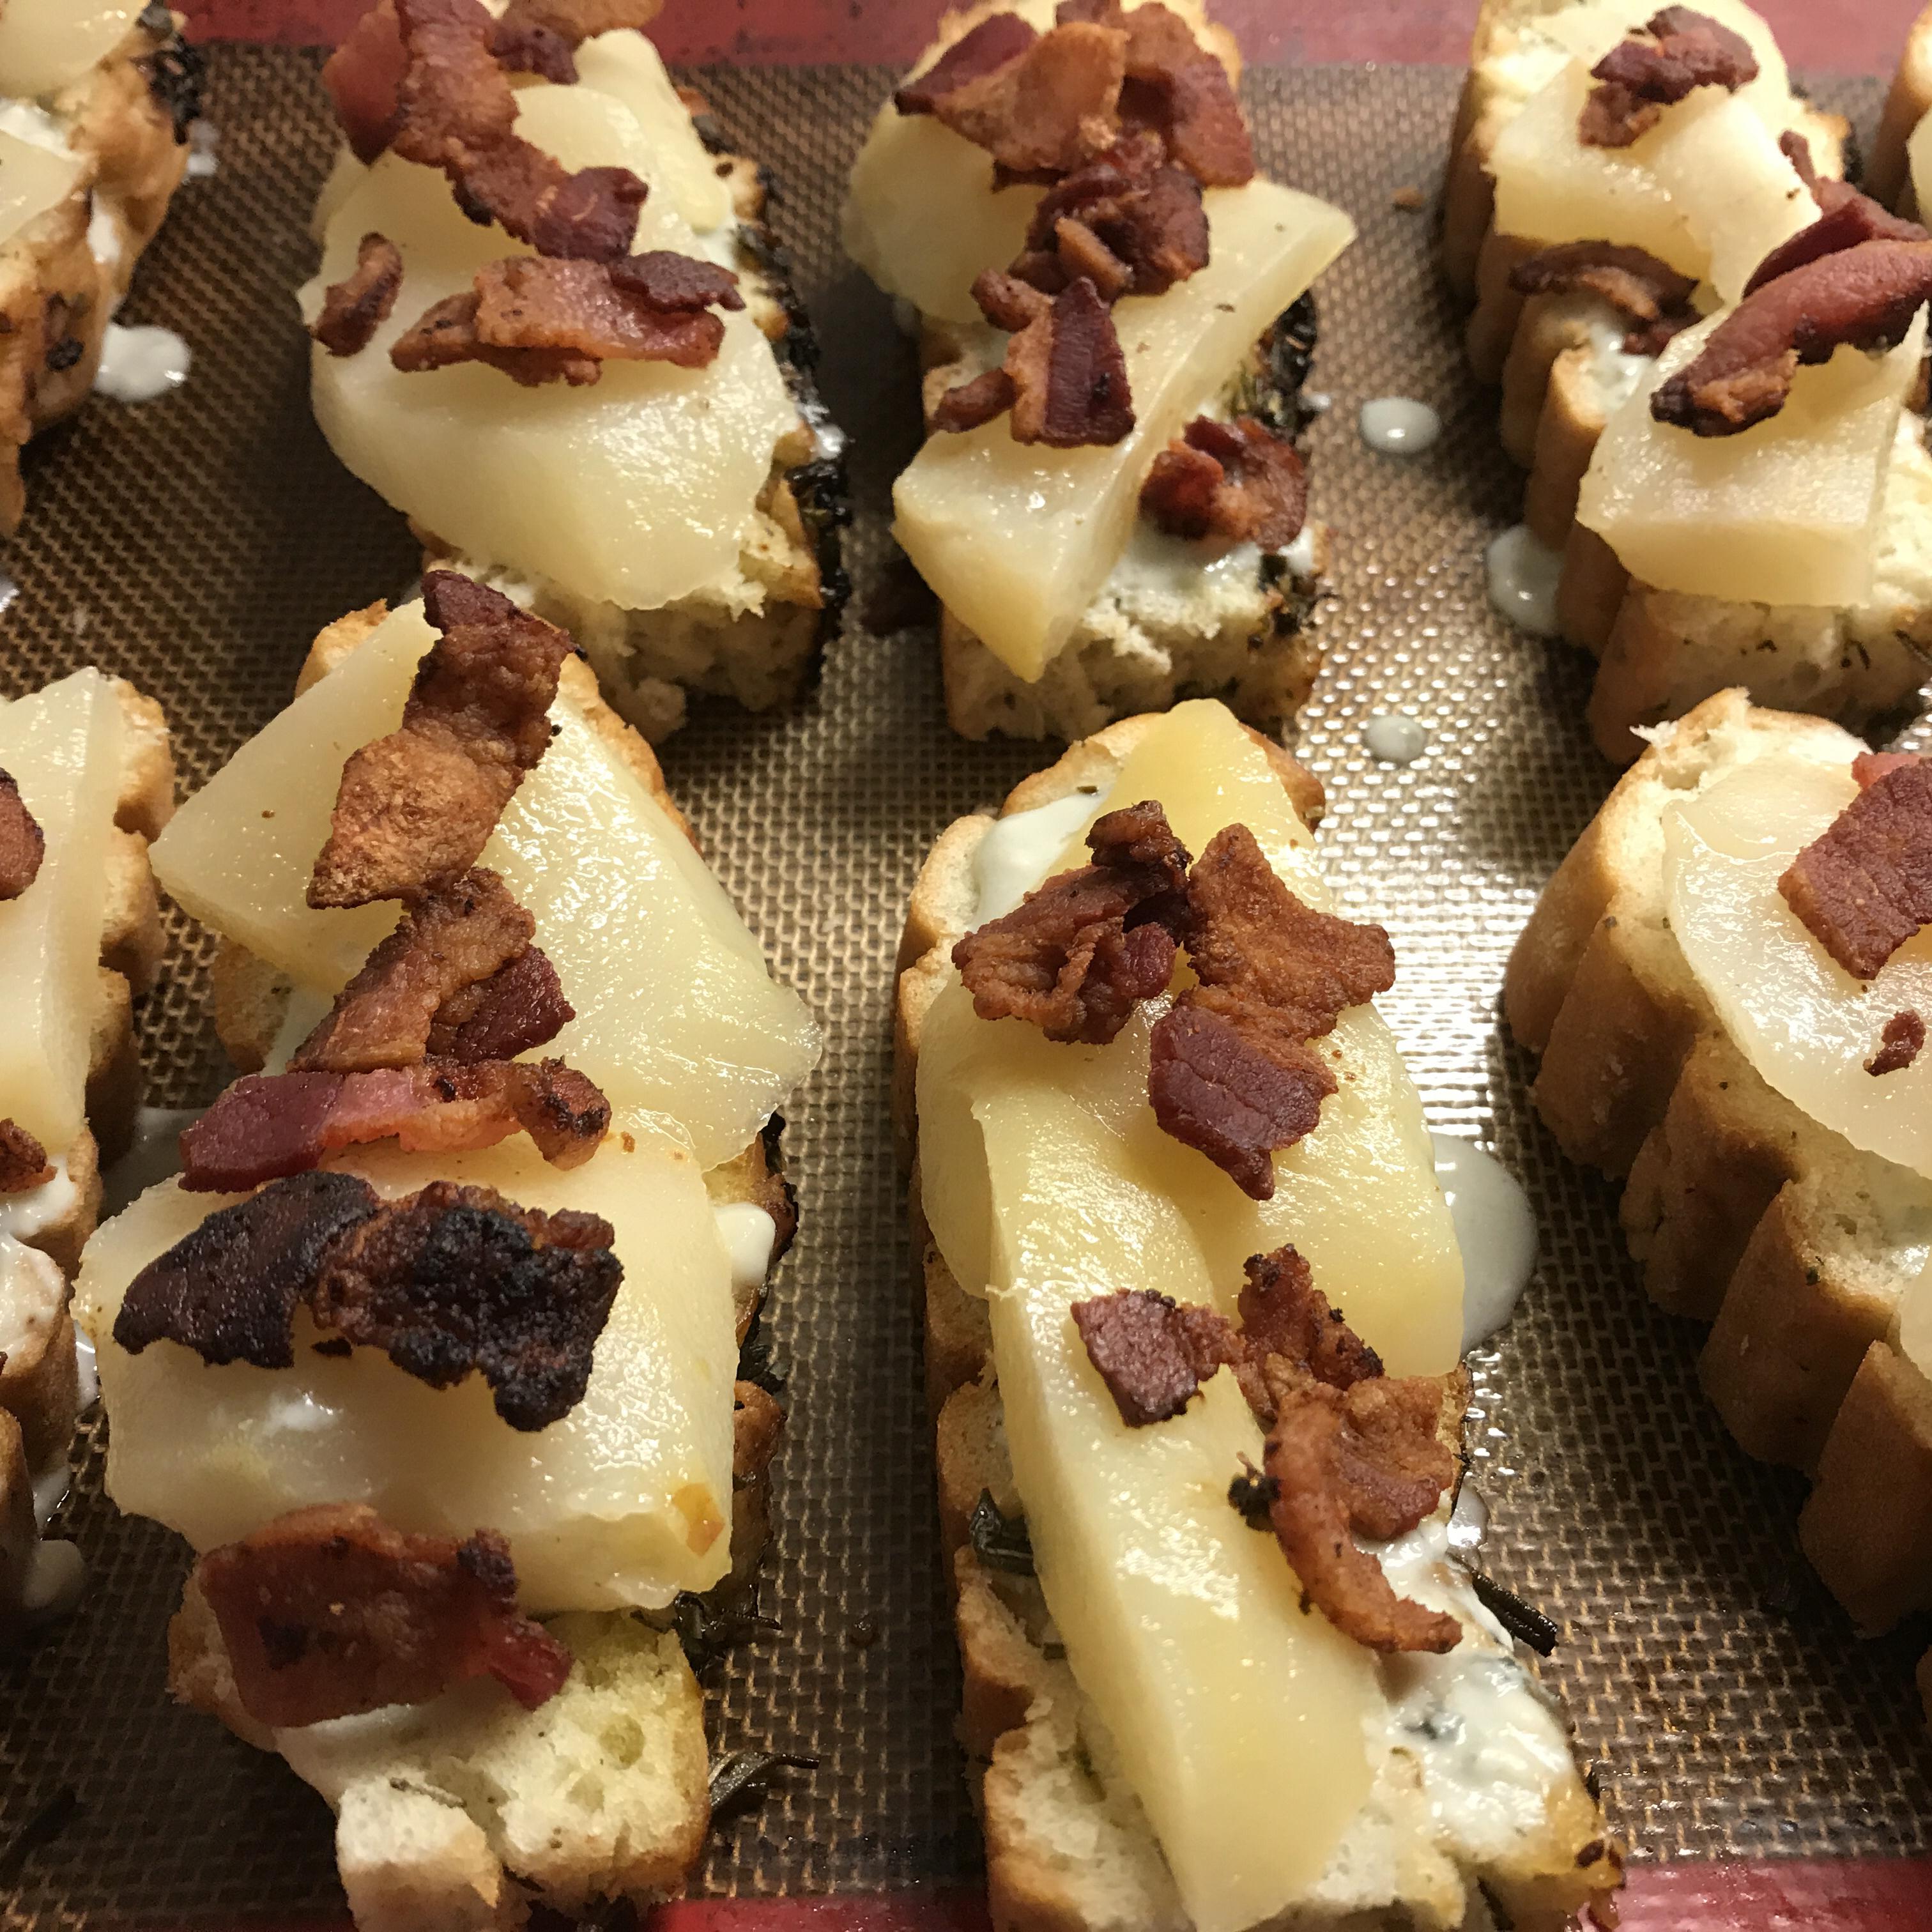 Blue Cheese, Bacon and Pear Brunch Sandwiches shaila